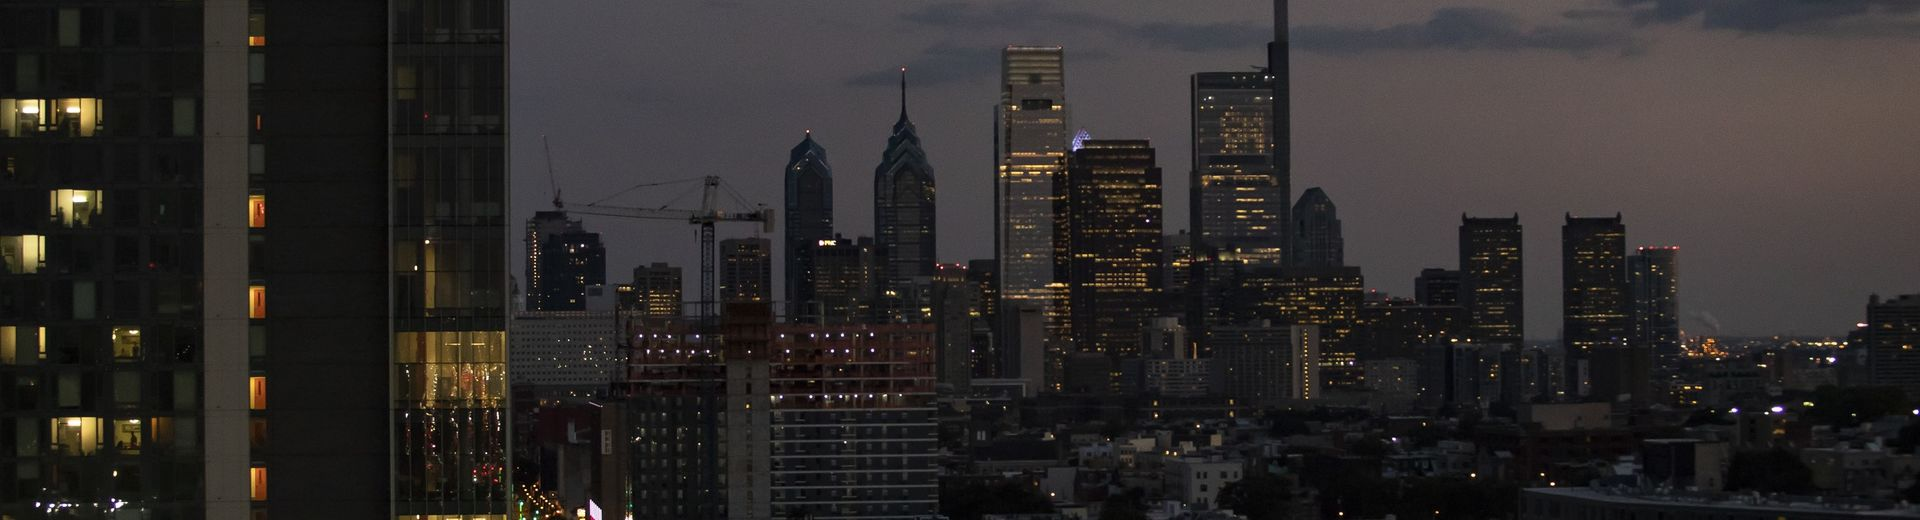 The downtown Philadelphia skyline at dusk.